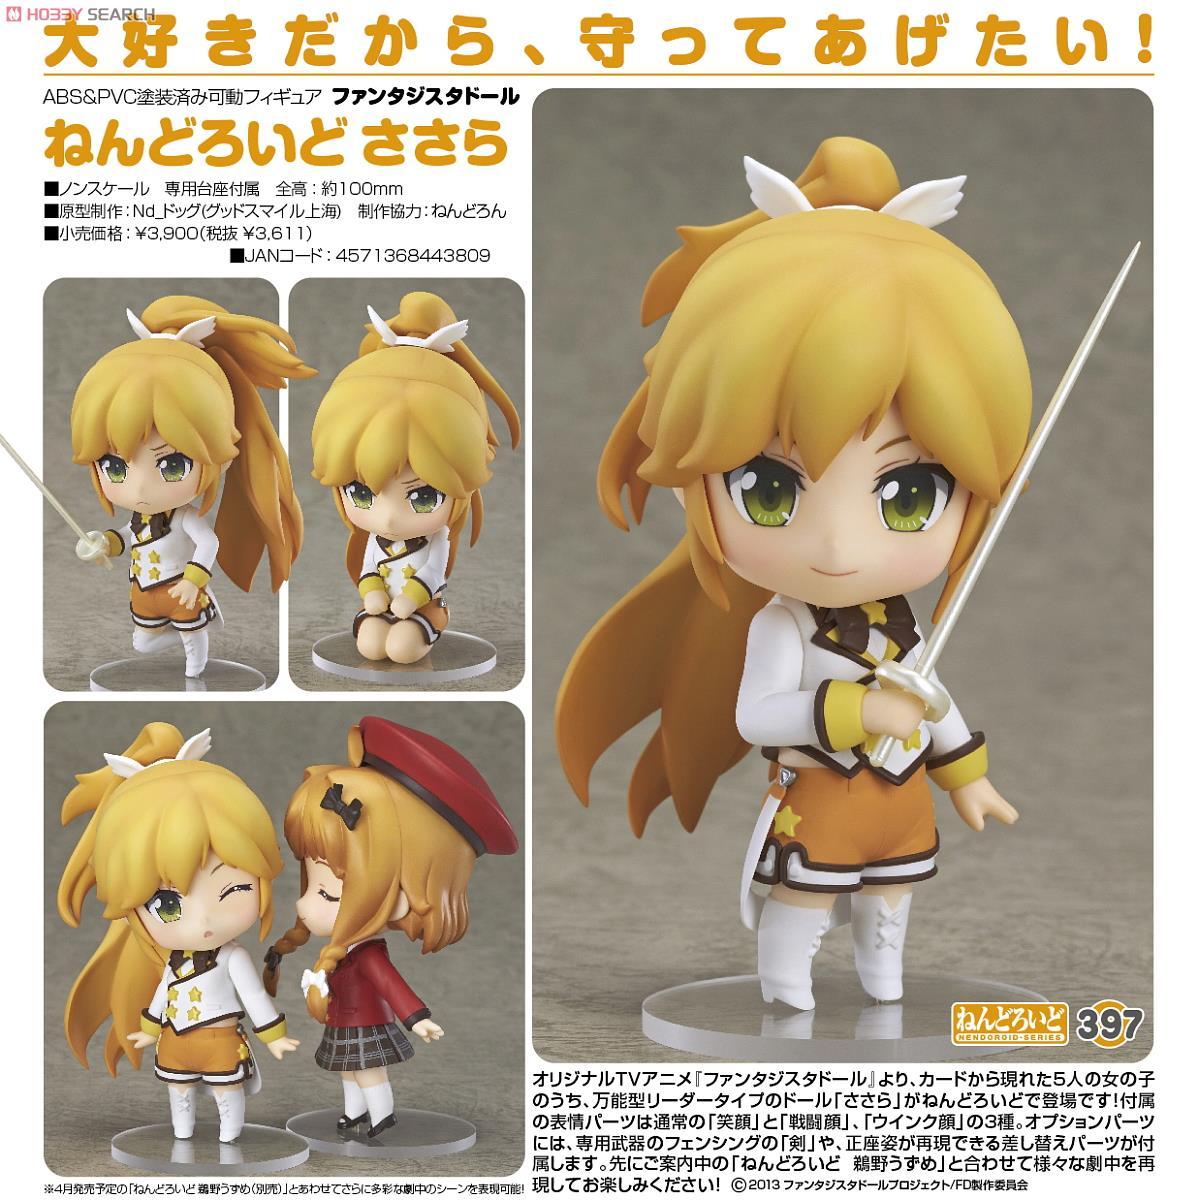 Nendoroid Sasara [Fantasista Doll]